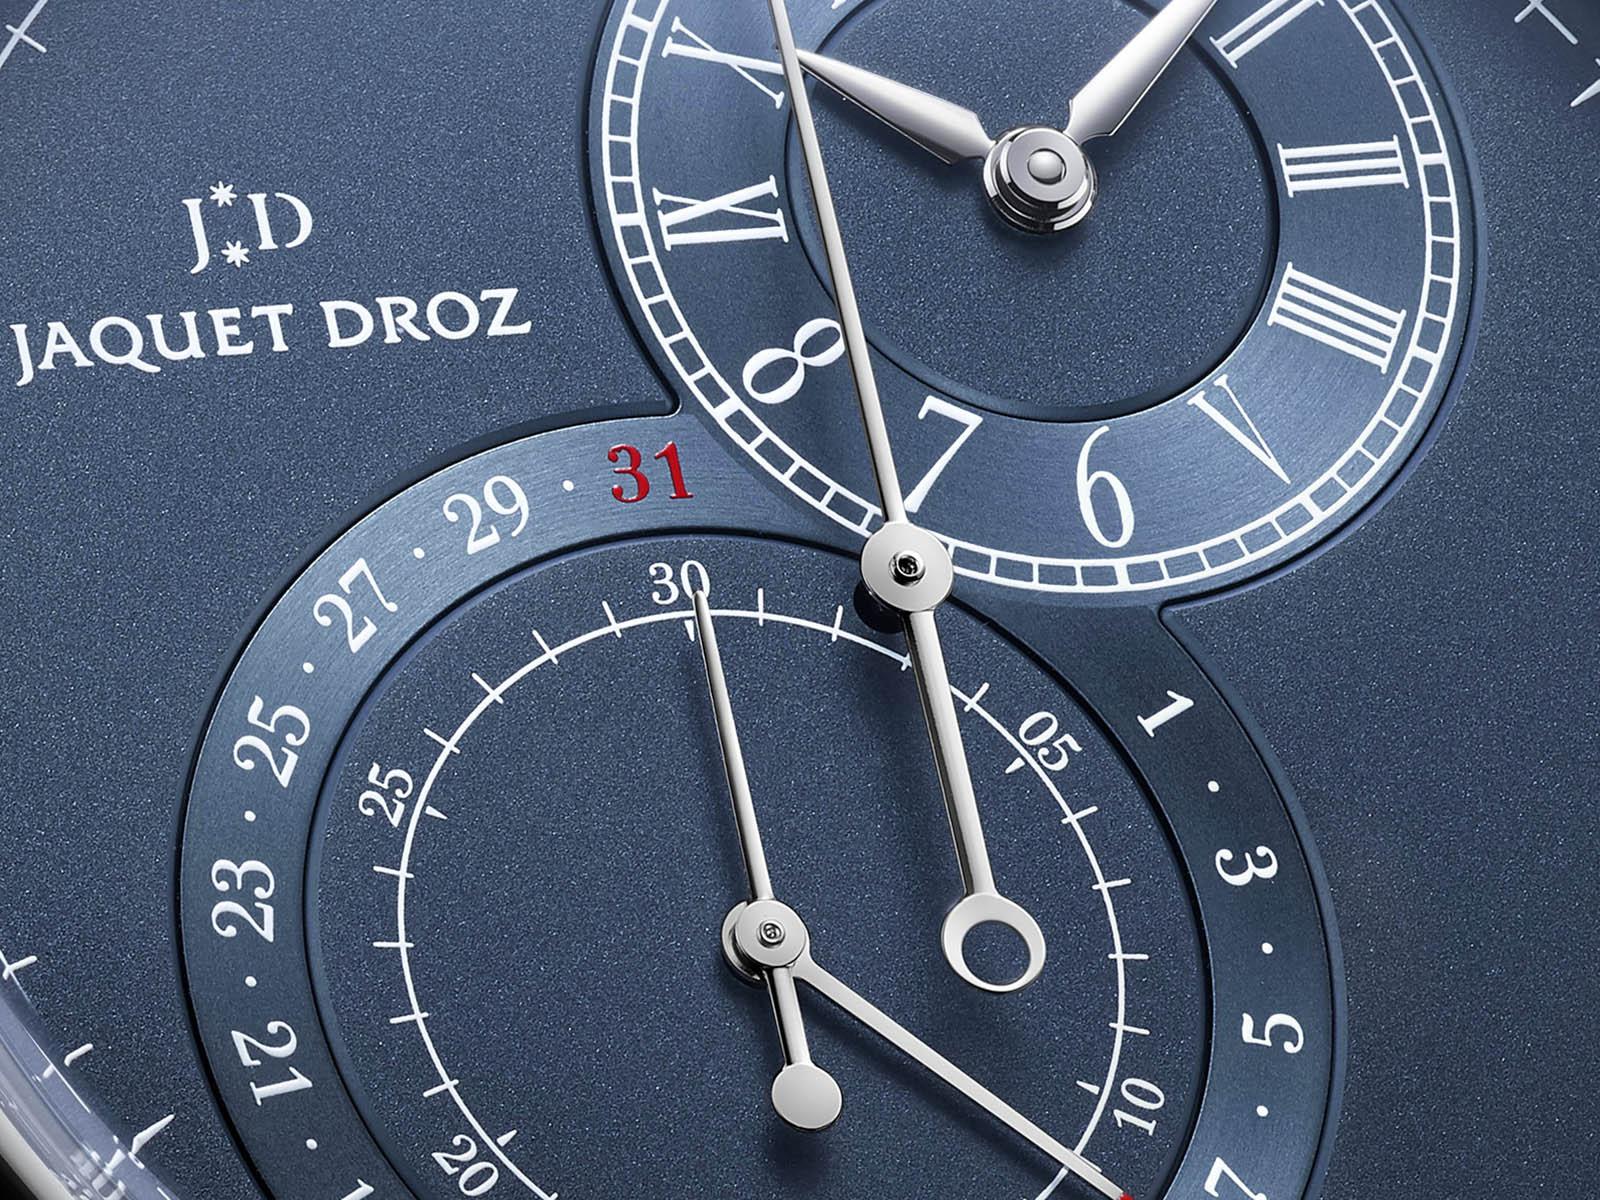 j007830241-jaquet-droz-grande-seconde-chronograph-blue-4.jpg